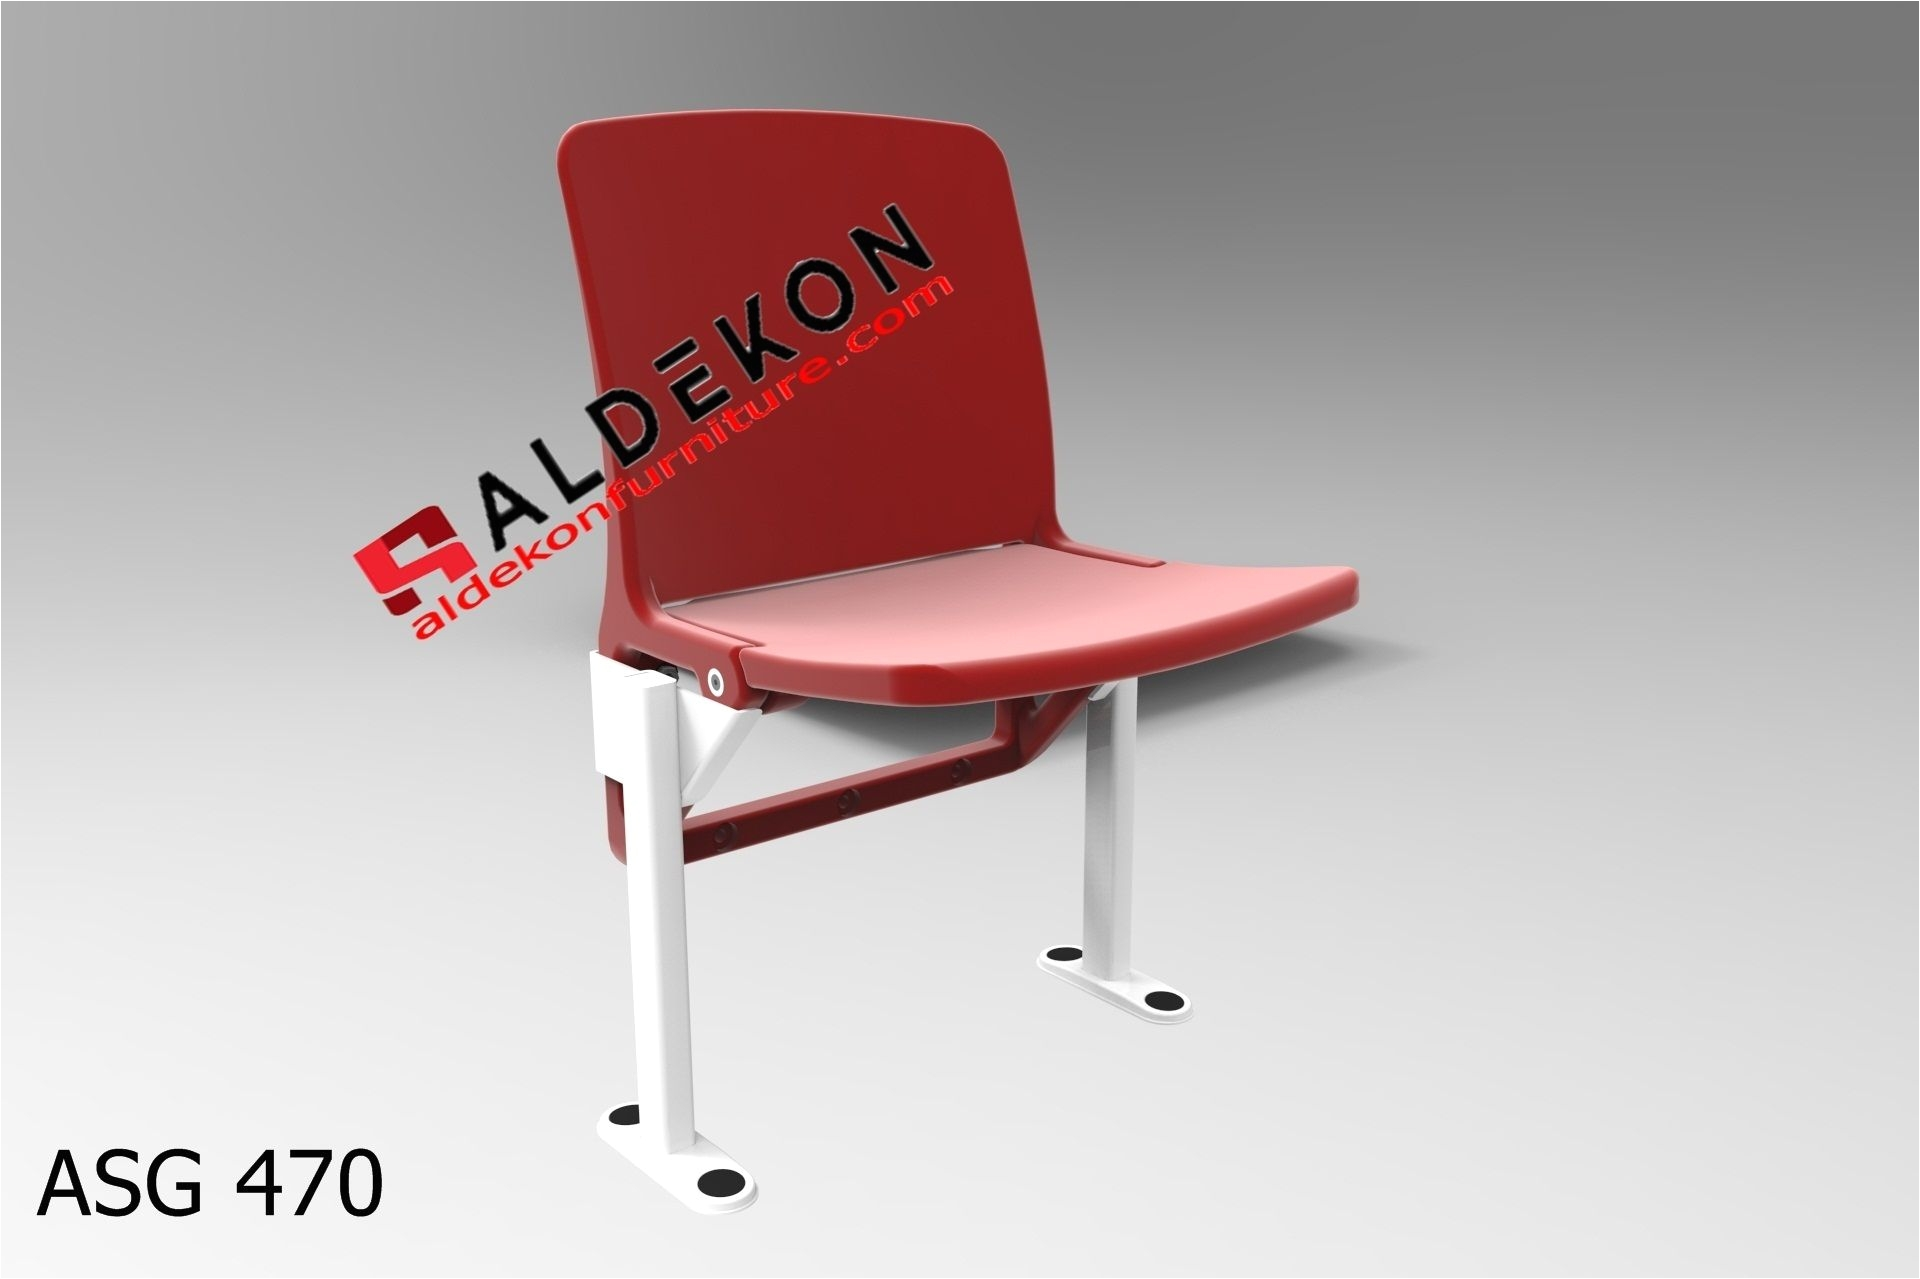 stadium seating companies uk cushions feet gym seating